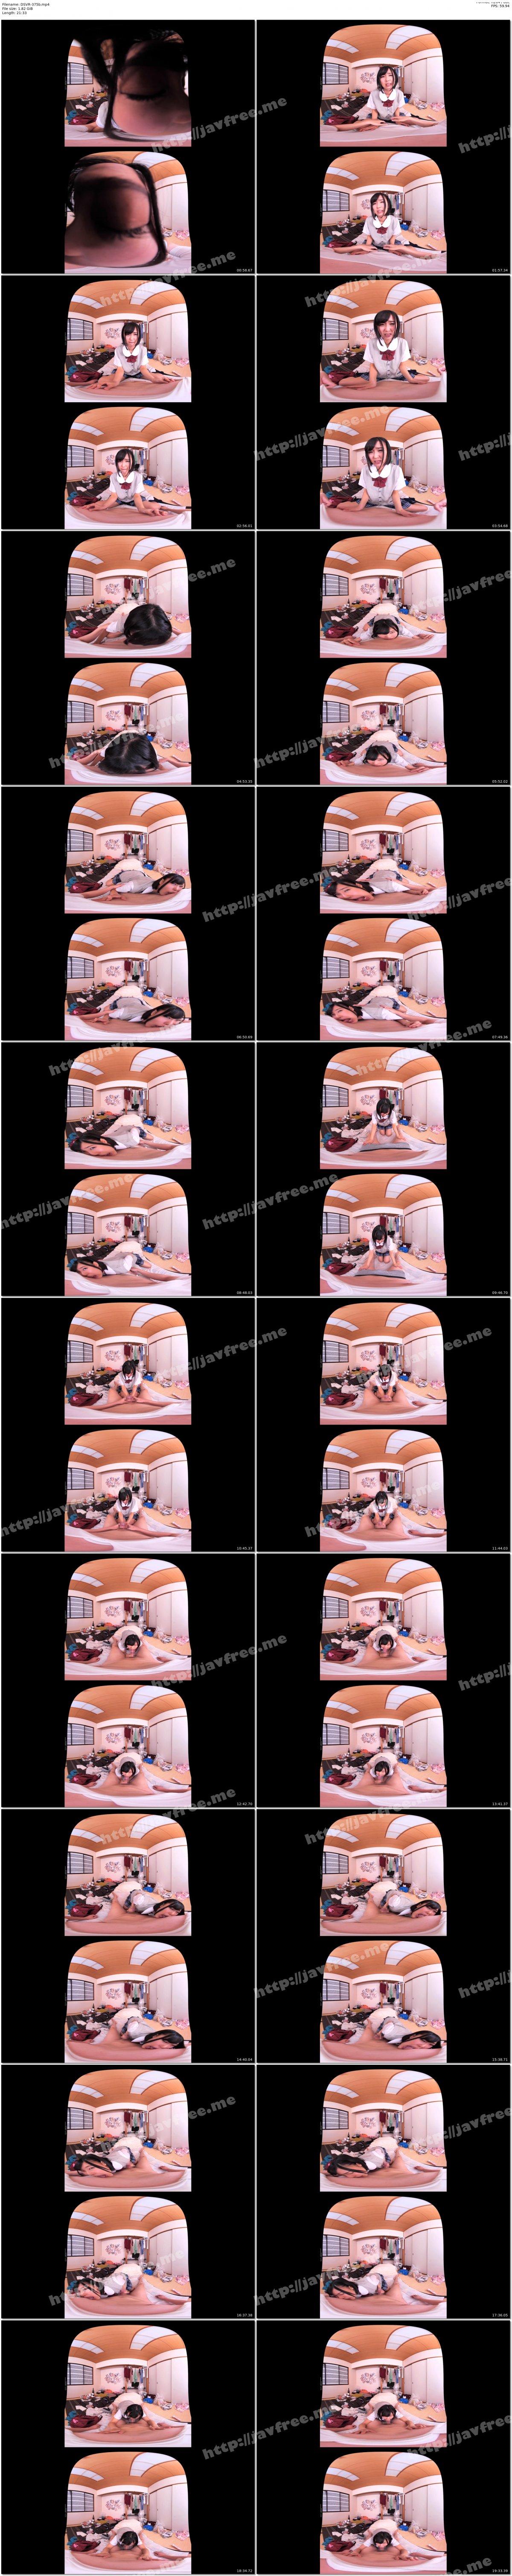 [DSVR-375] 【VR】真面目そうな訳アリ女子○生を汚部屋連れ込み変態凌辱援交 - image DSVR-375b on https://javfree.me